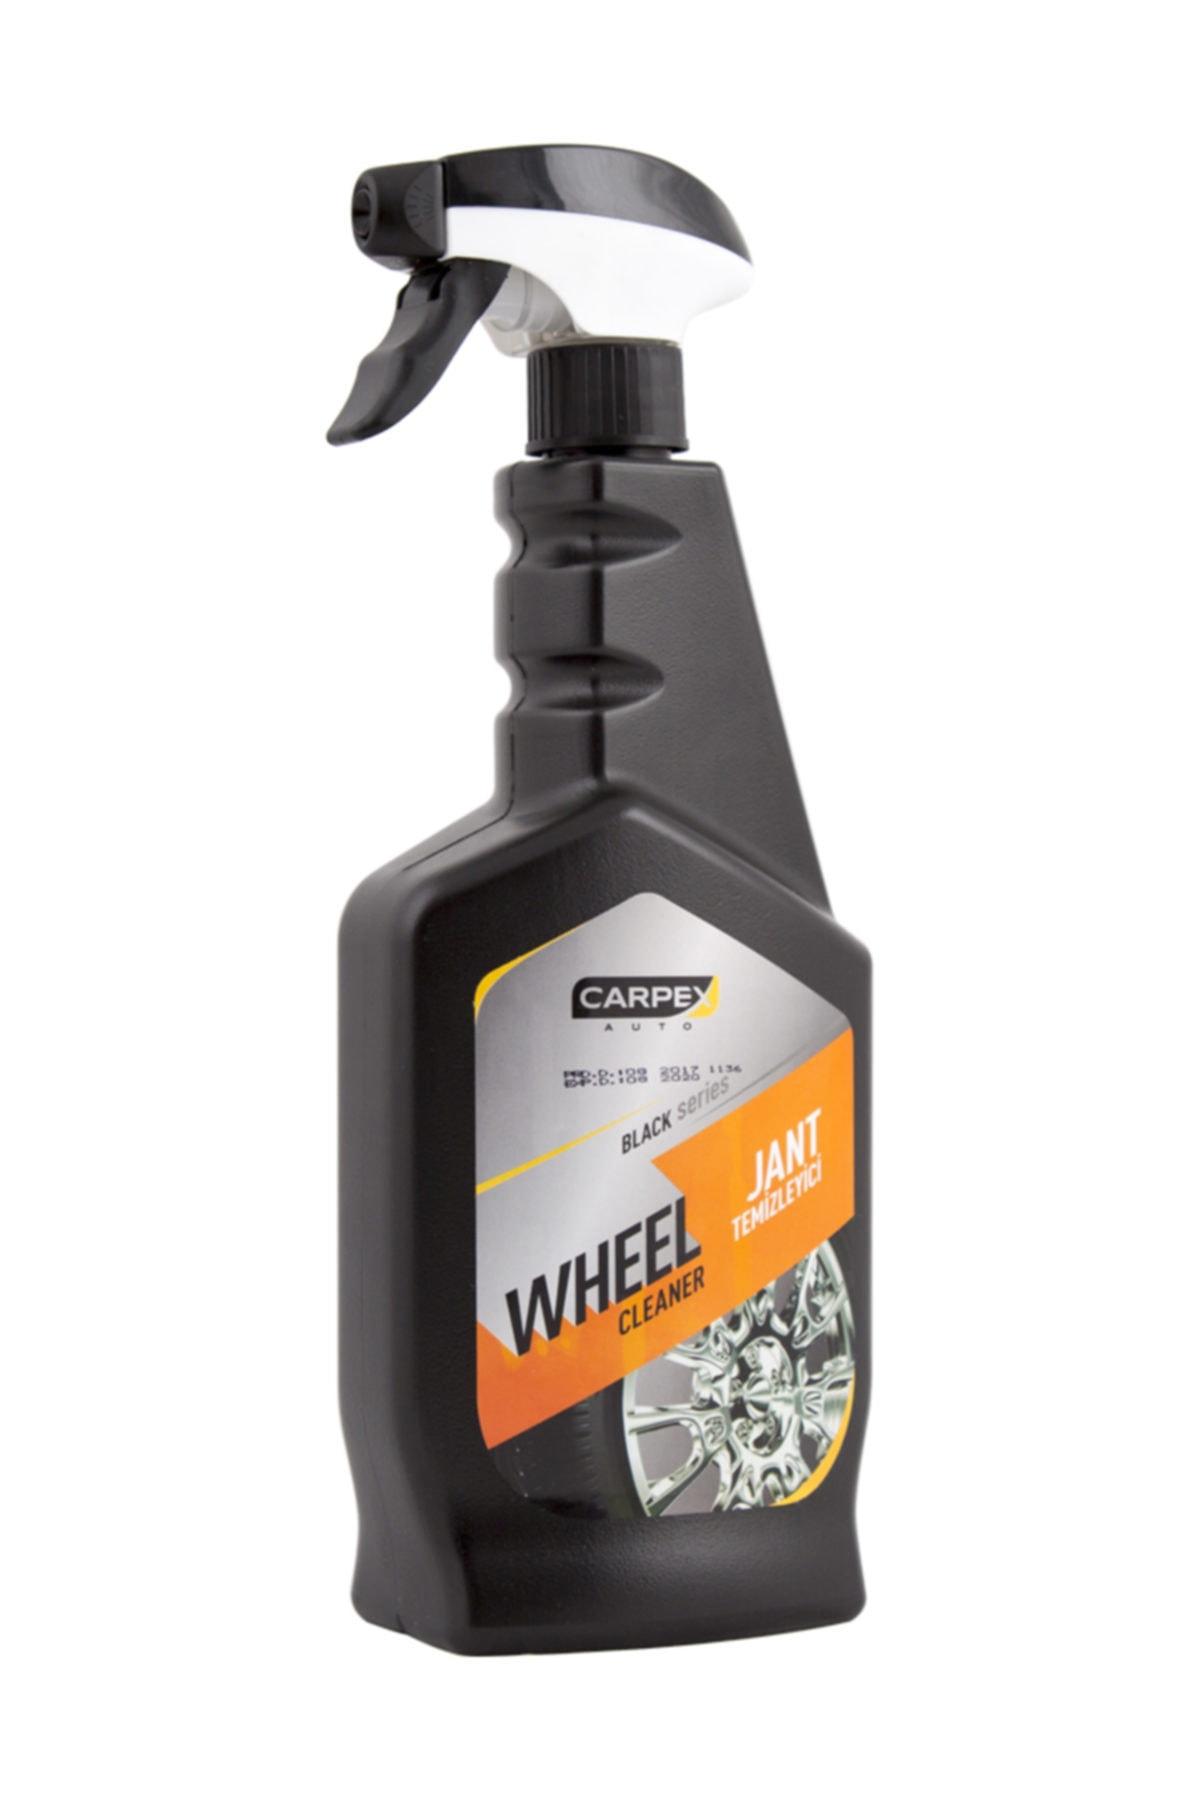 Carpex Jant Temizleyici Black Series 600 ml 2